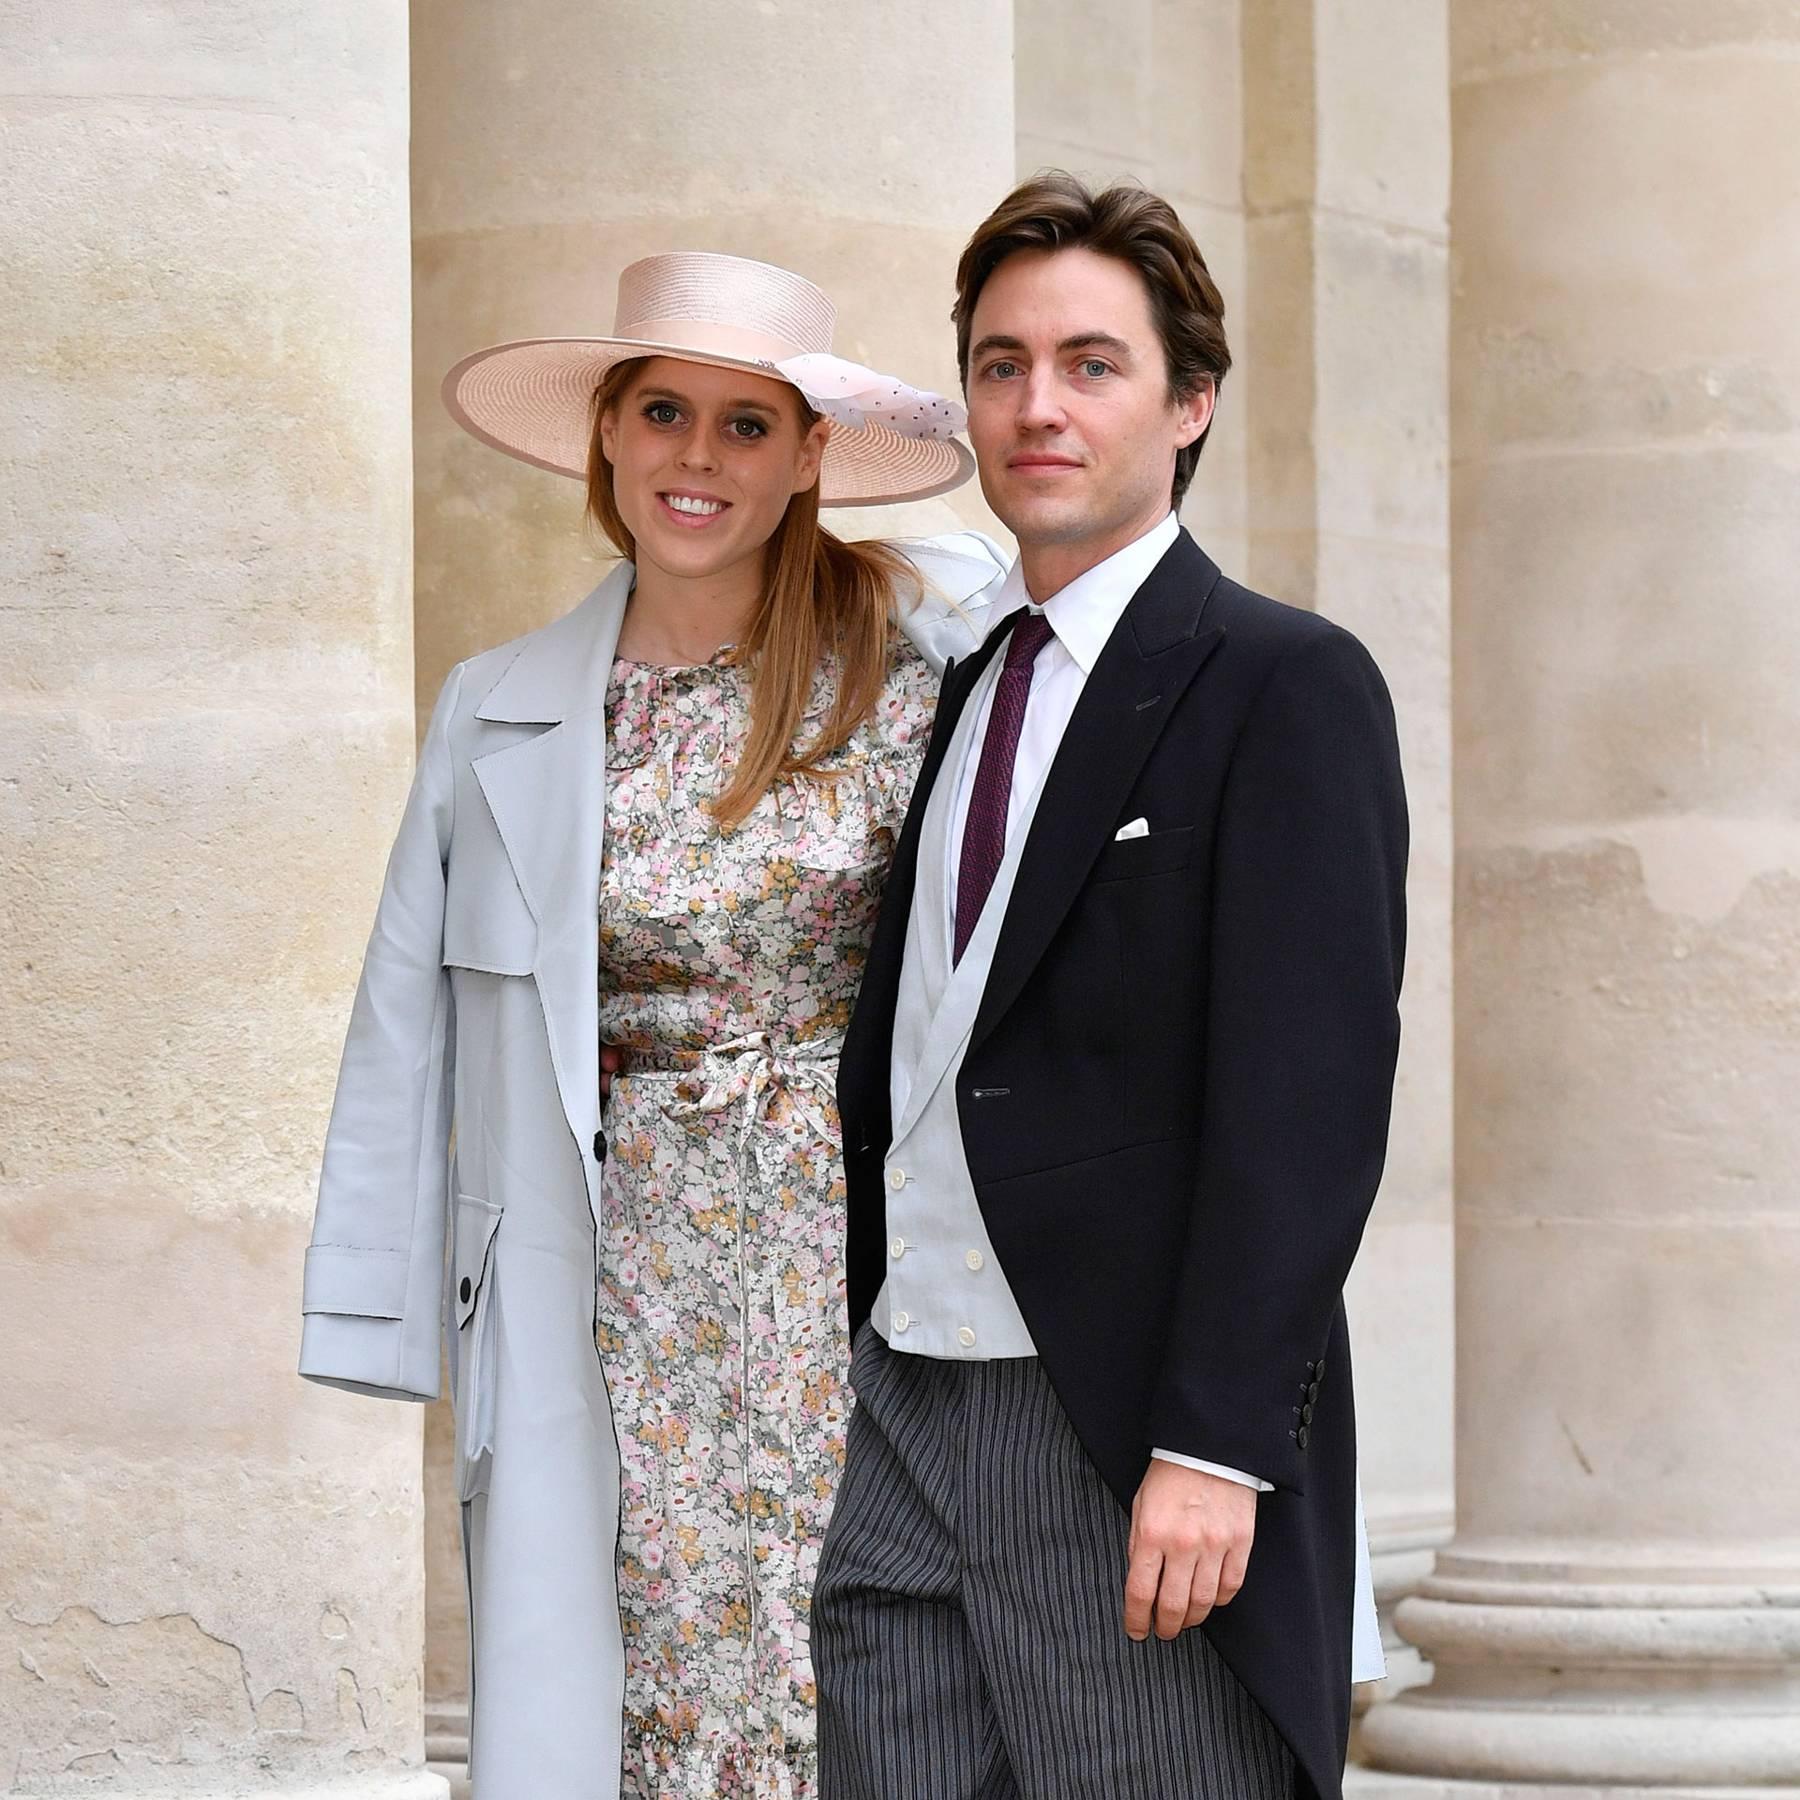 Princess Beatrice celebrates fiancé Edoardo Mapelli Mozzi's birthday